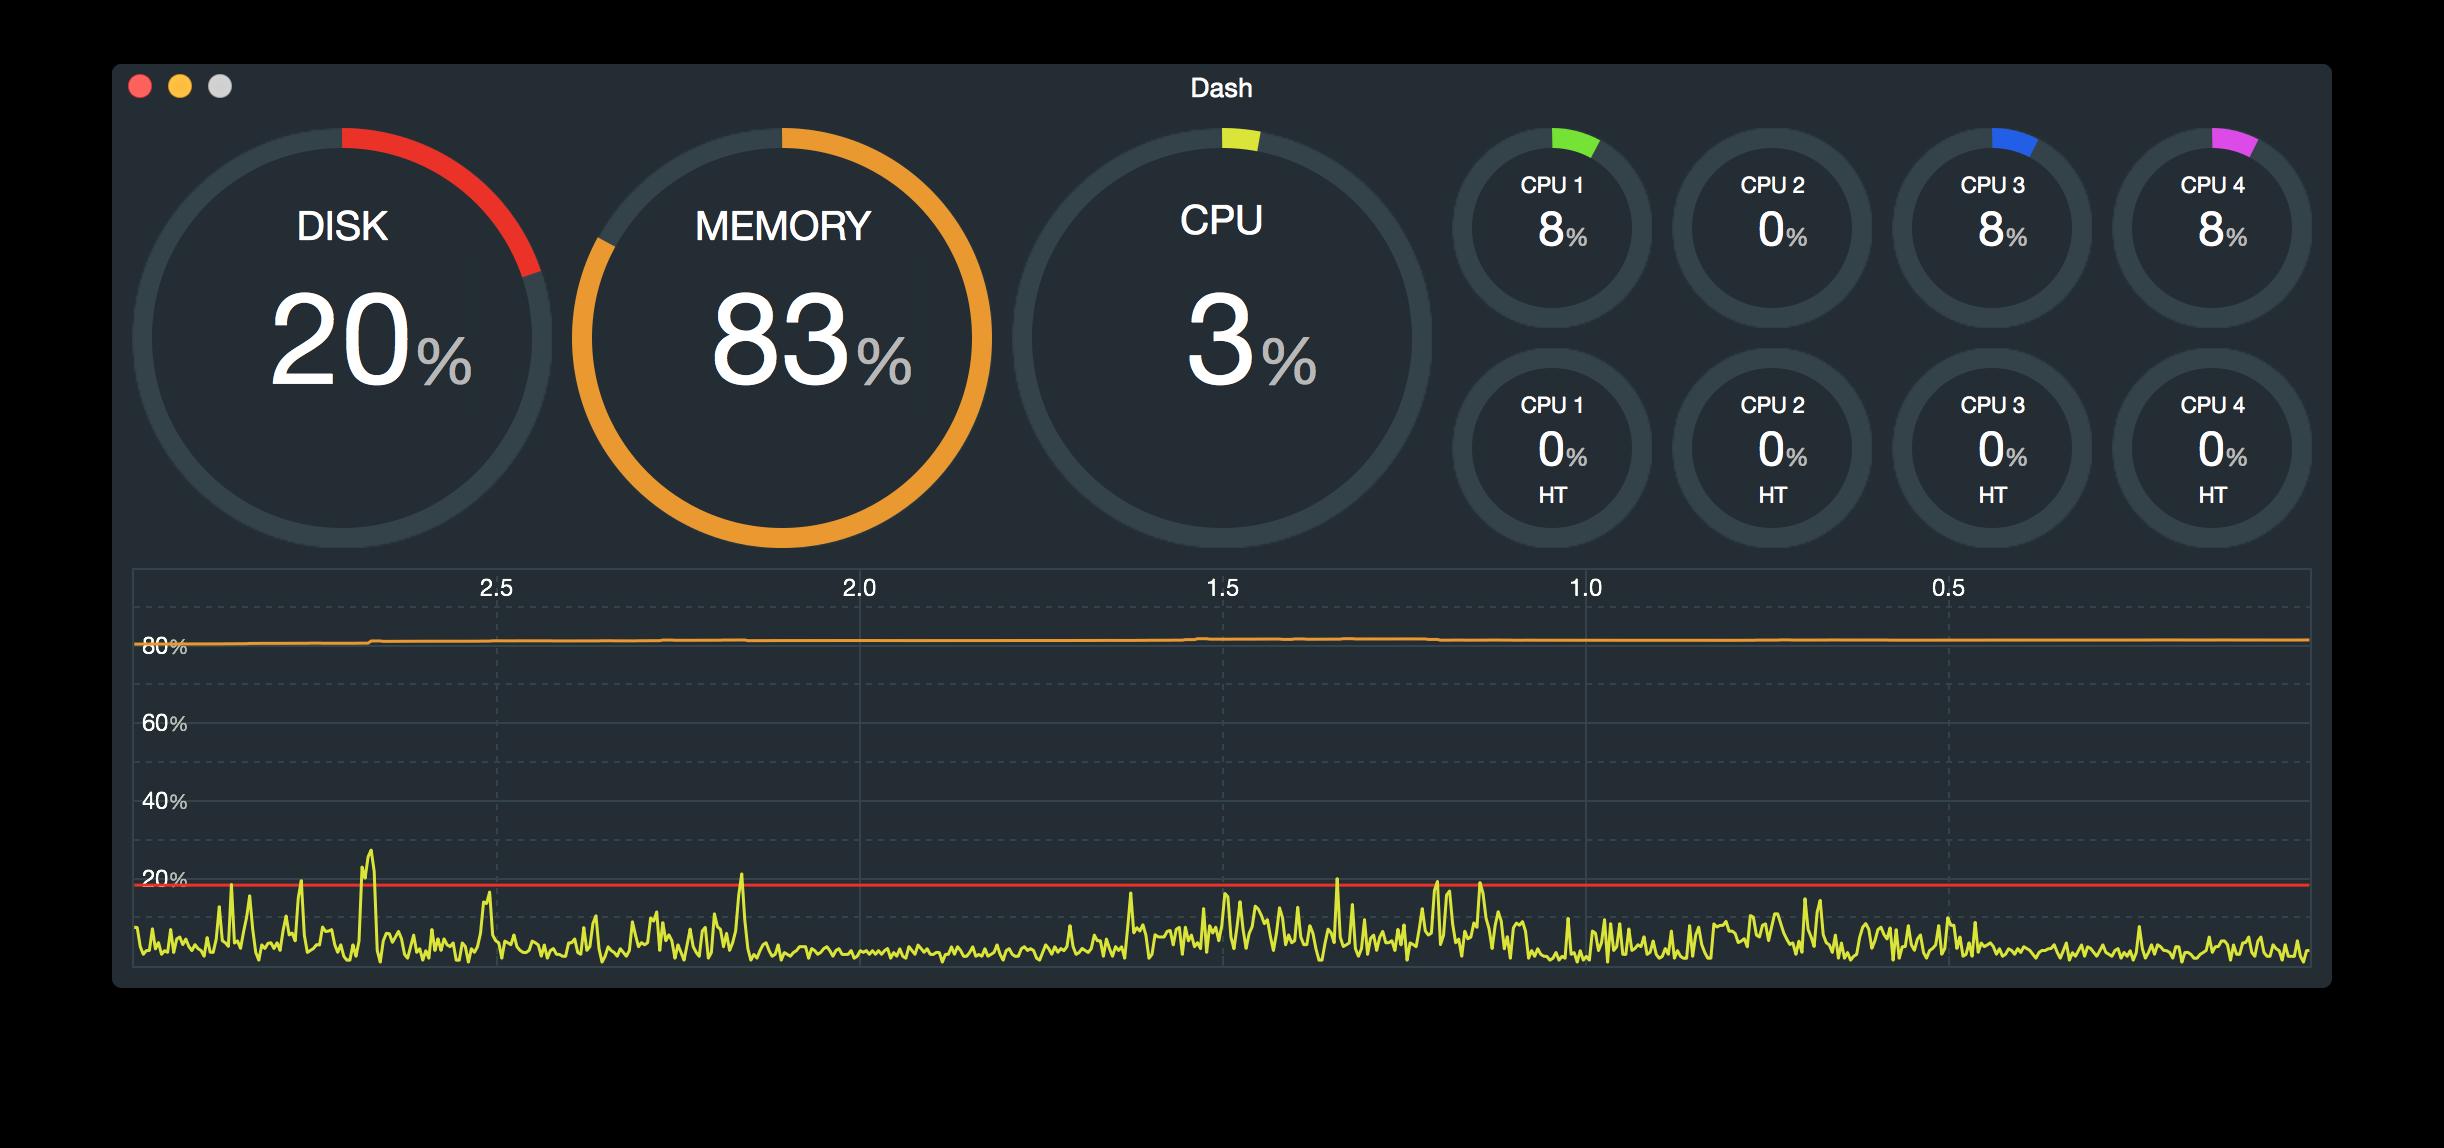 Dash 1.32 running on MacBook Pro.